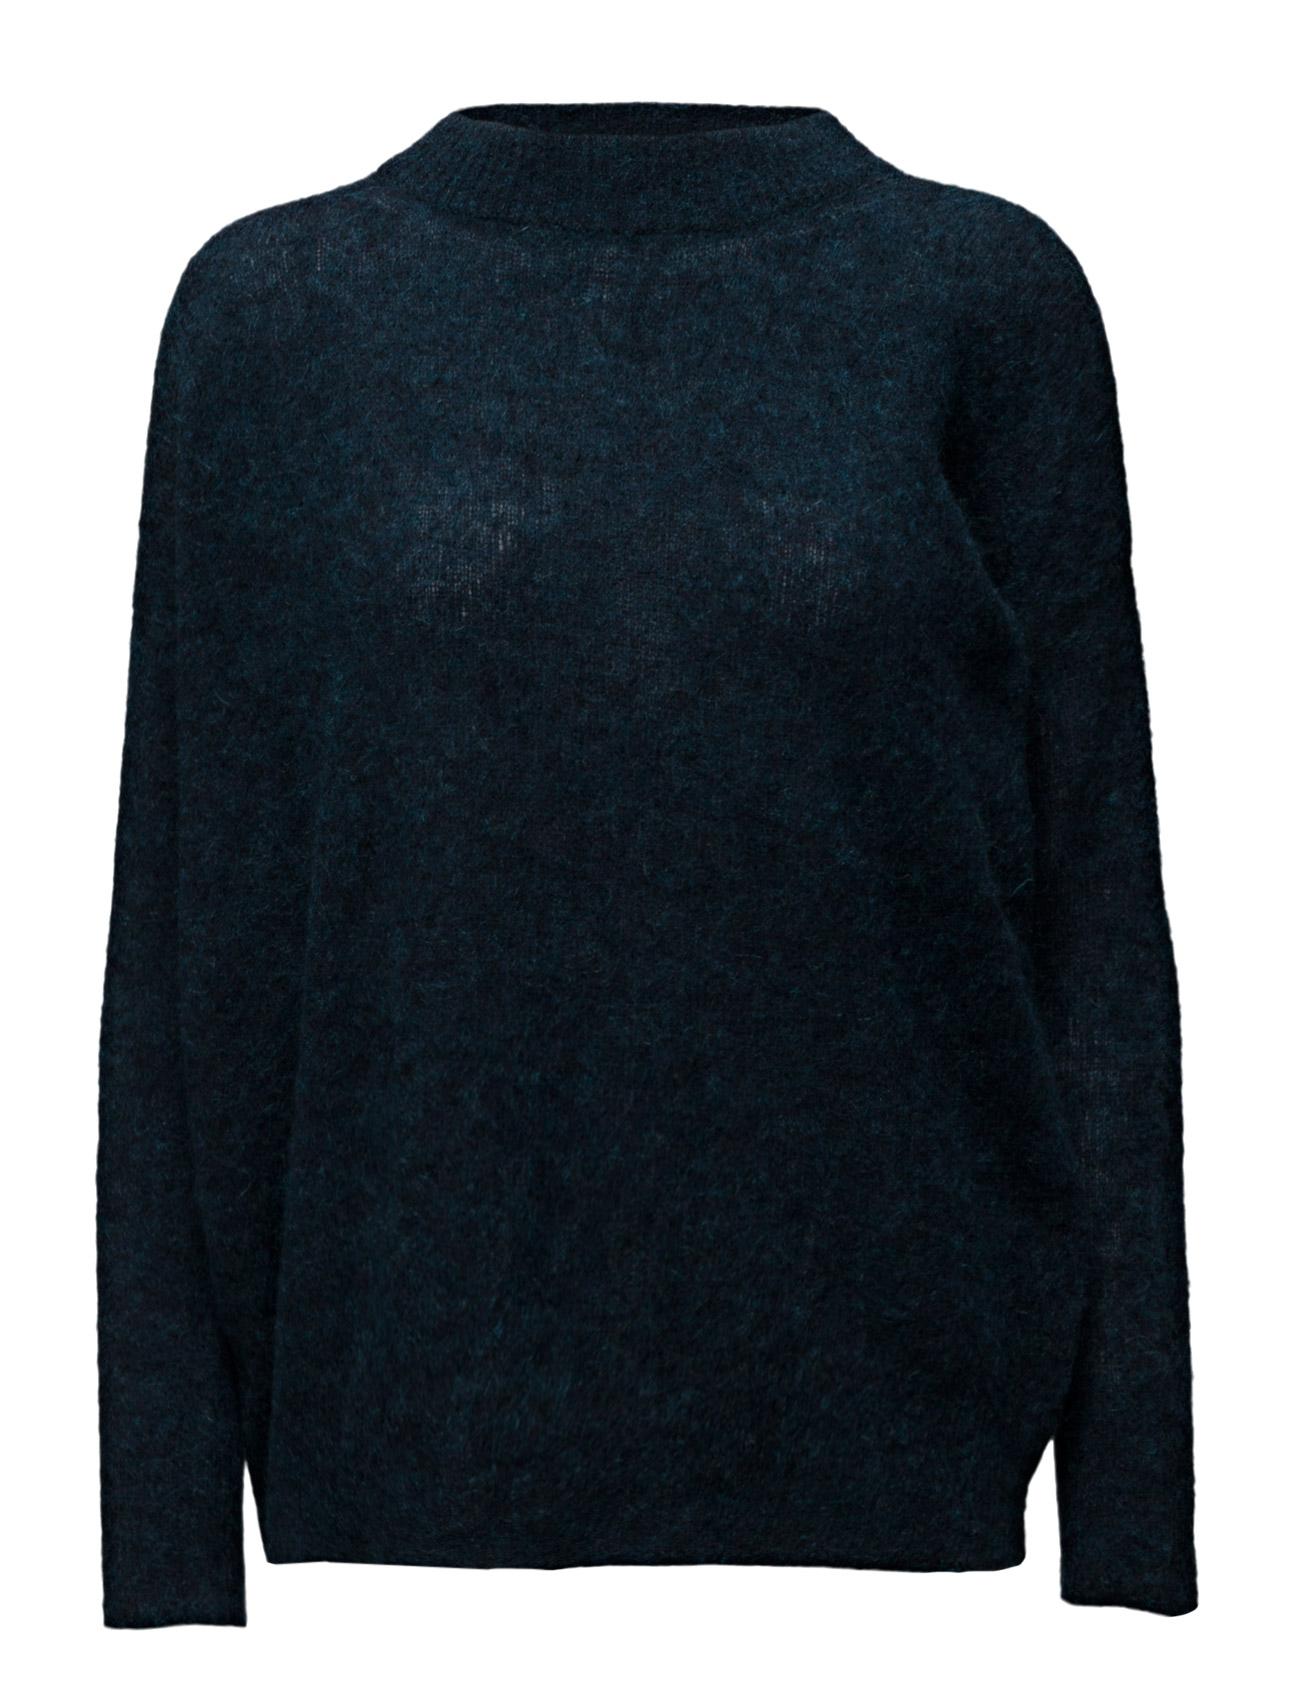 Clodia Knit Crewneck Stig P Sweatshirts til Kvinder i